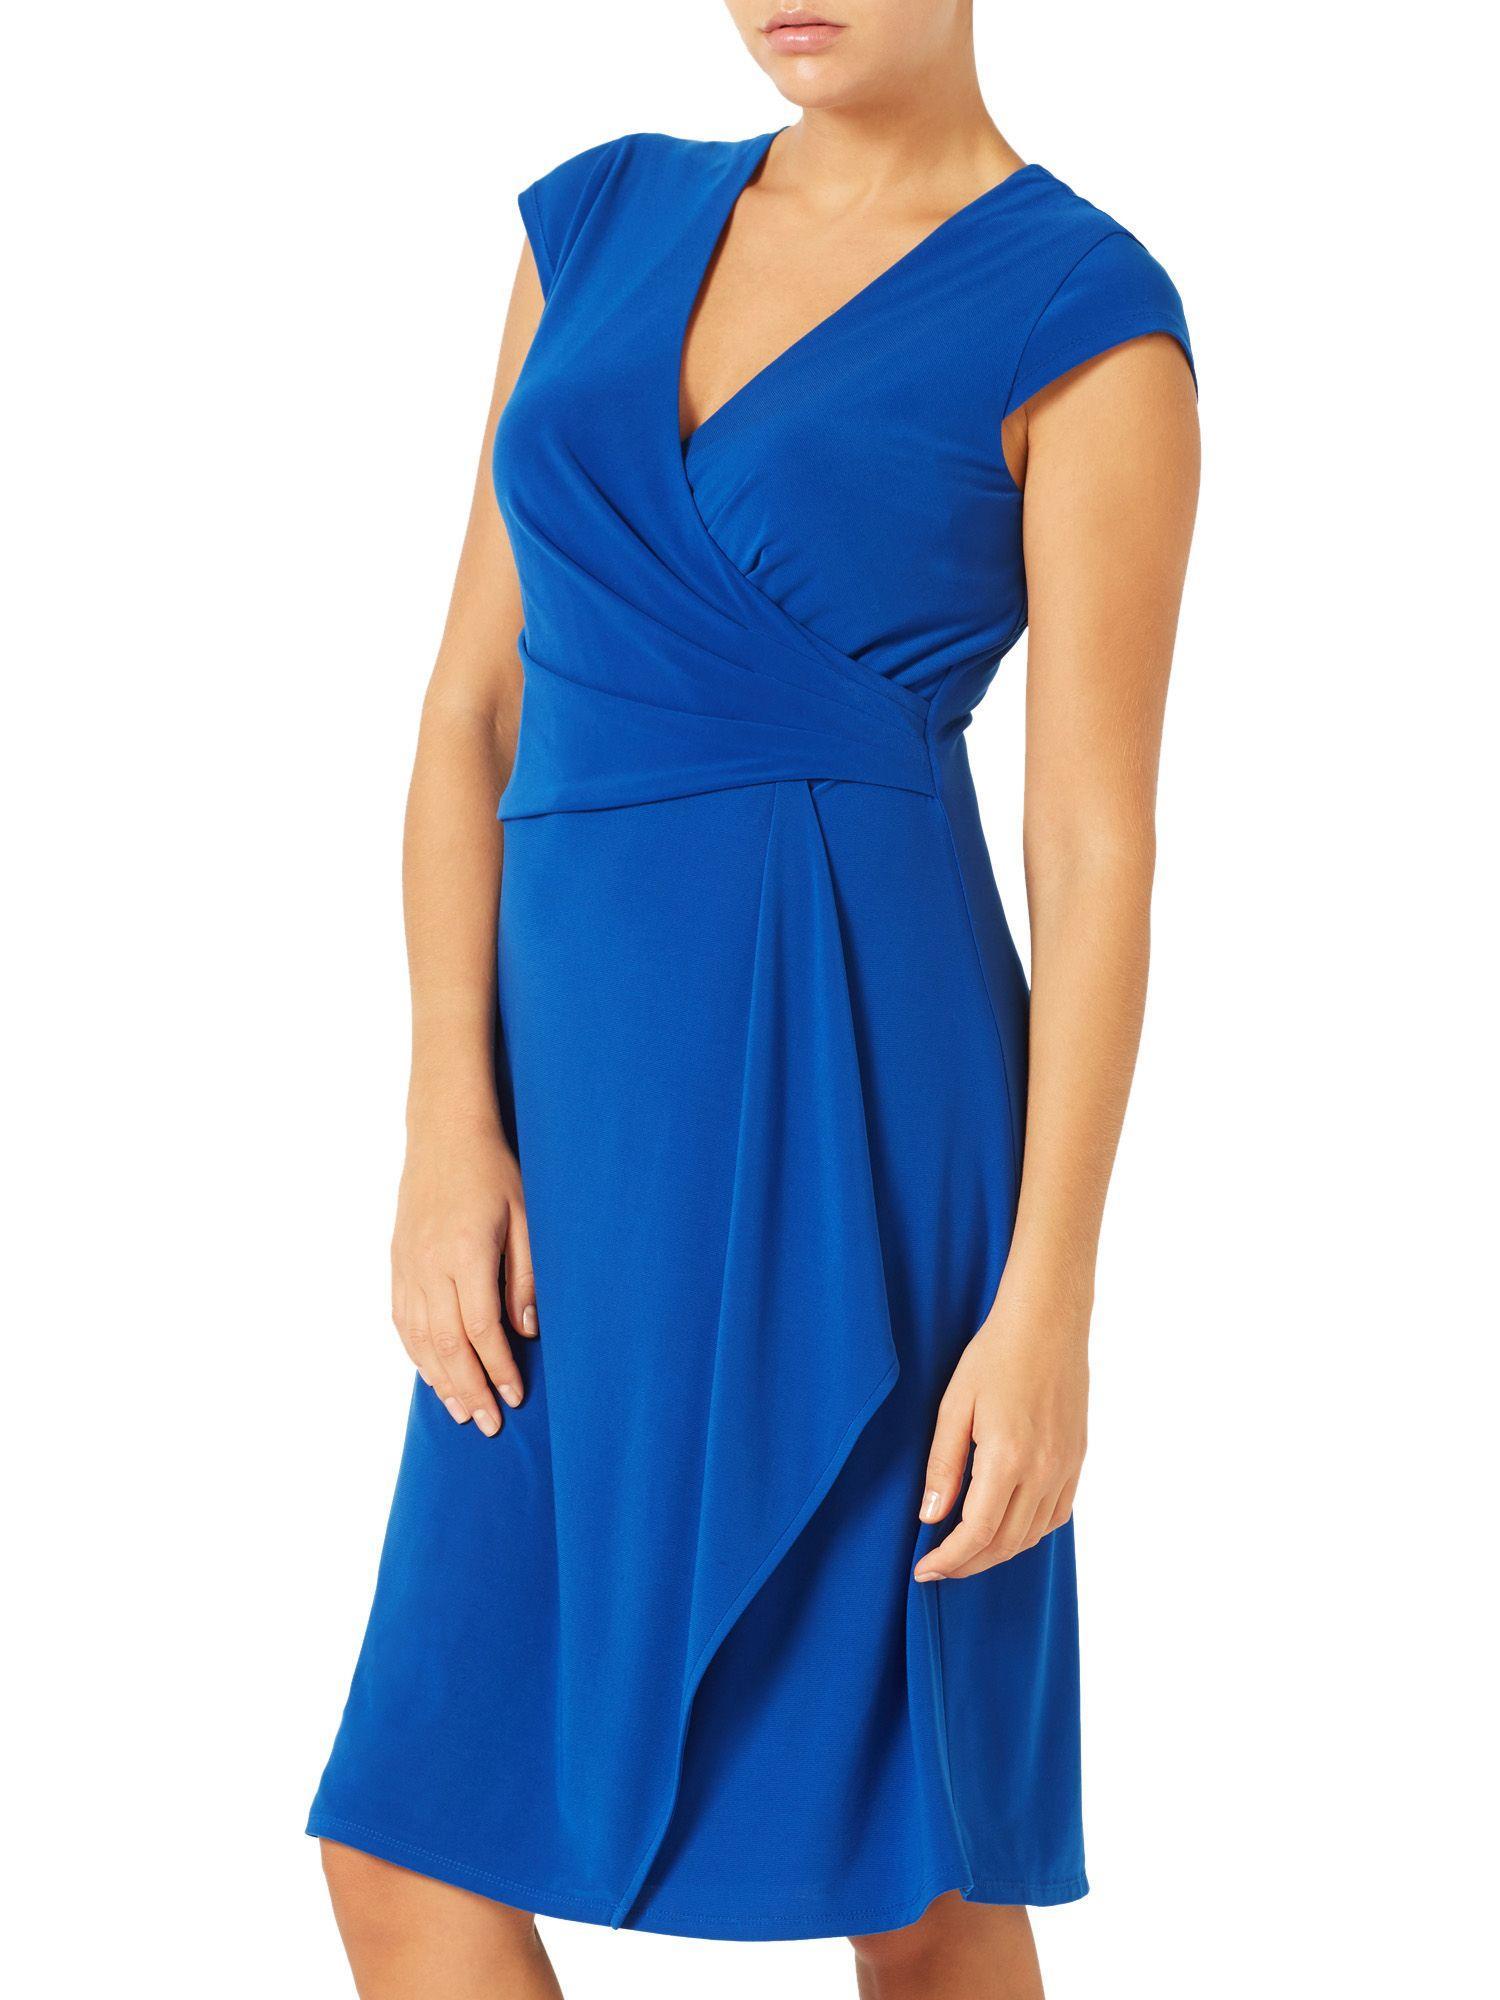 Lyst jacques vert waterfall detail jersey dress in blue for Waterfall design dress